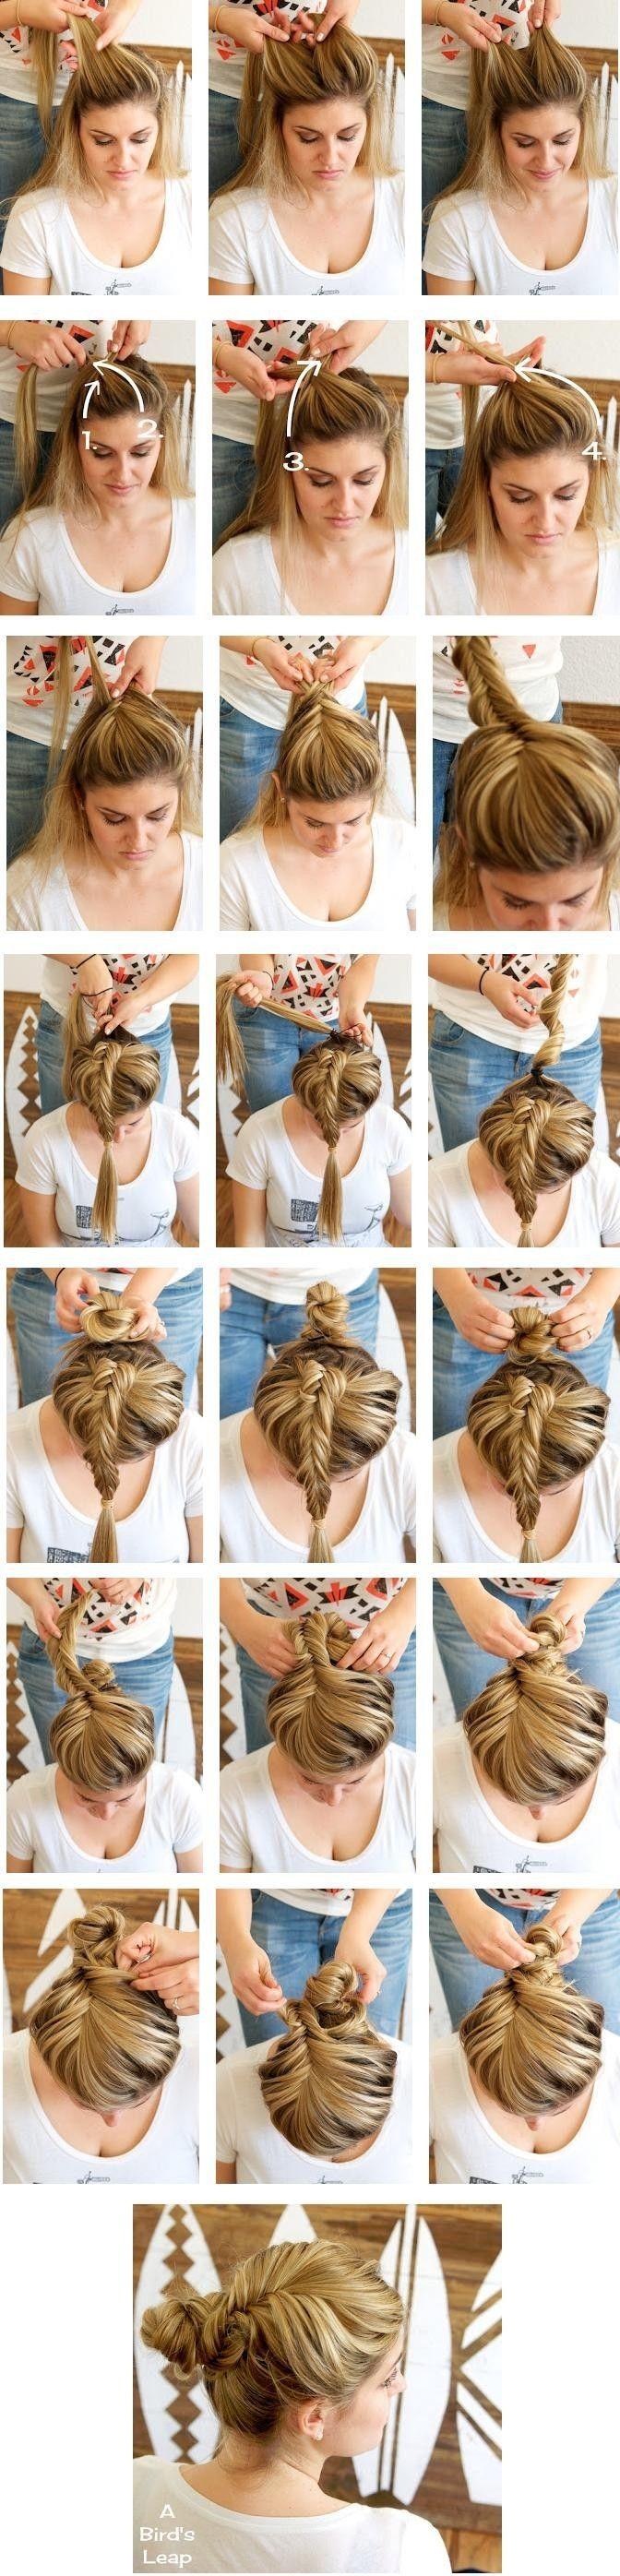 Fishtail Braided Bun Hairstyle Tutorial: Girl Hairstyles for Long Hair